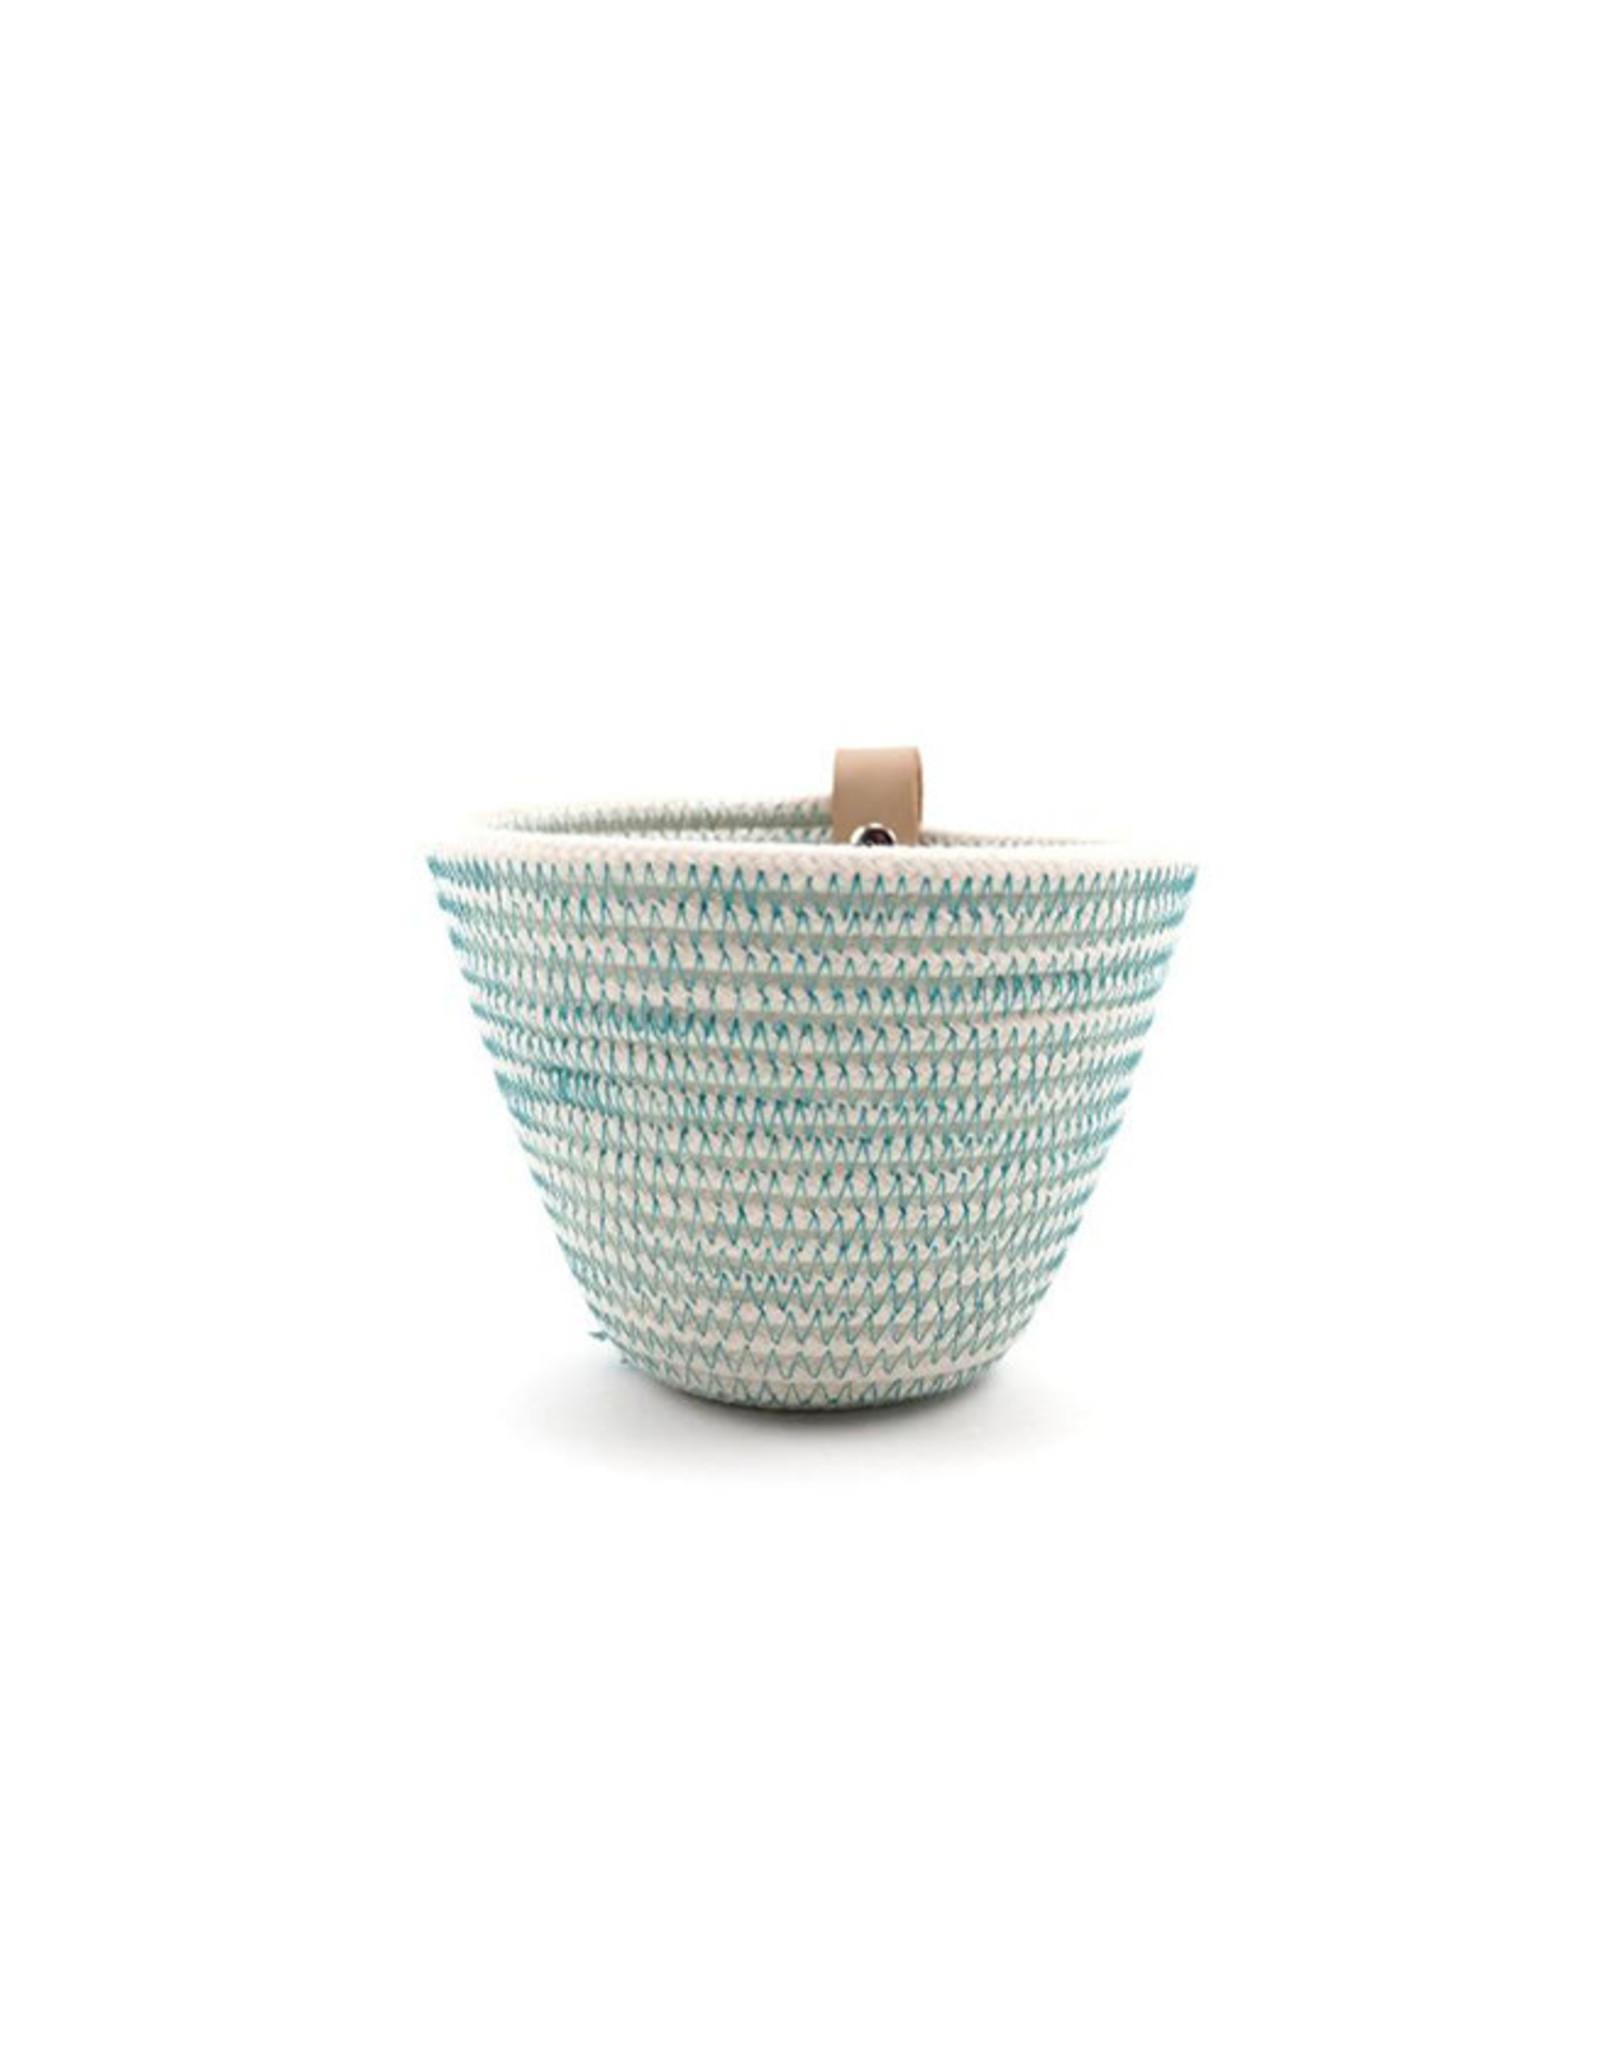 Koba Handmade Mini Bowl High-turquoise 10x8cm